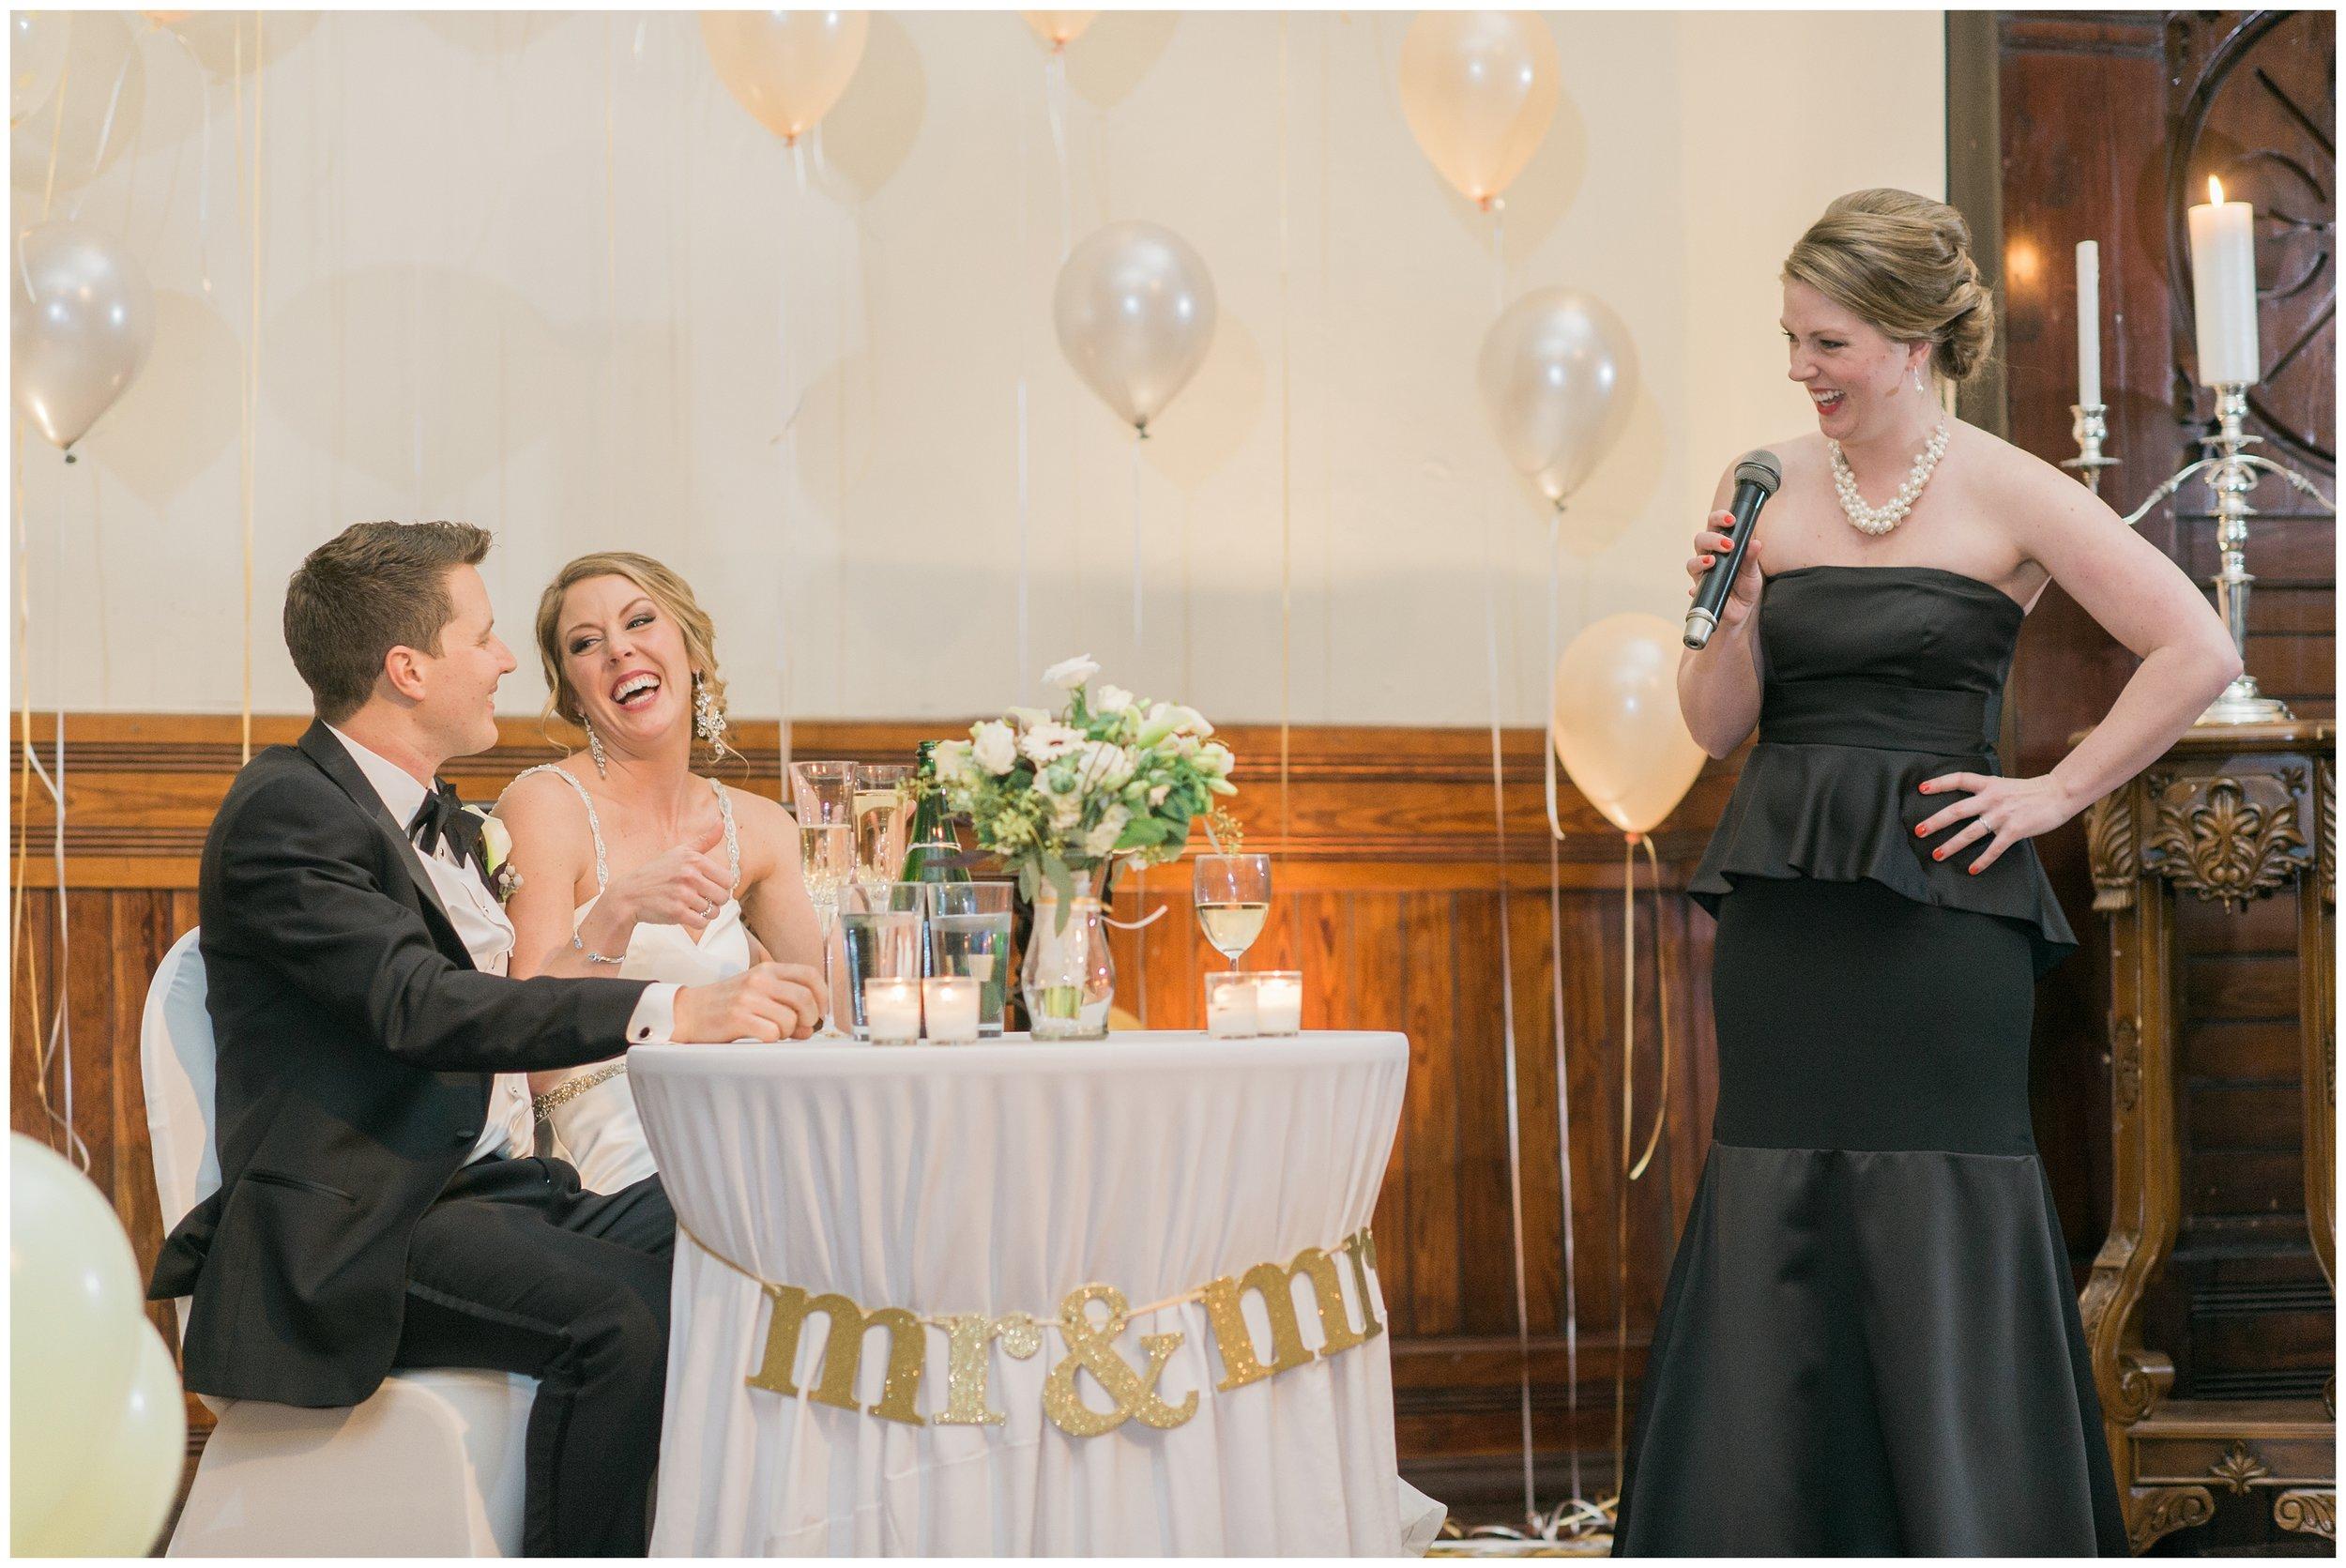 Rebecca_Bridges_Photography_Indianapolis_Wedding_Photographer_5844.jpg